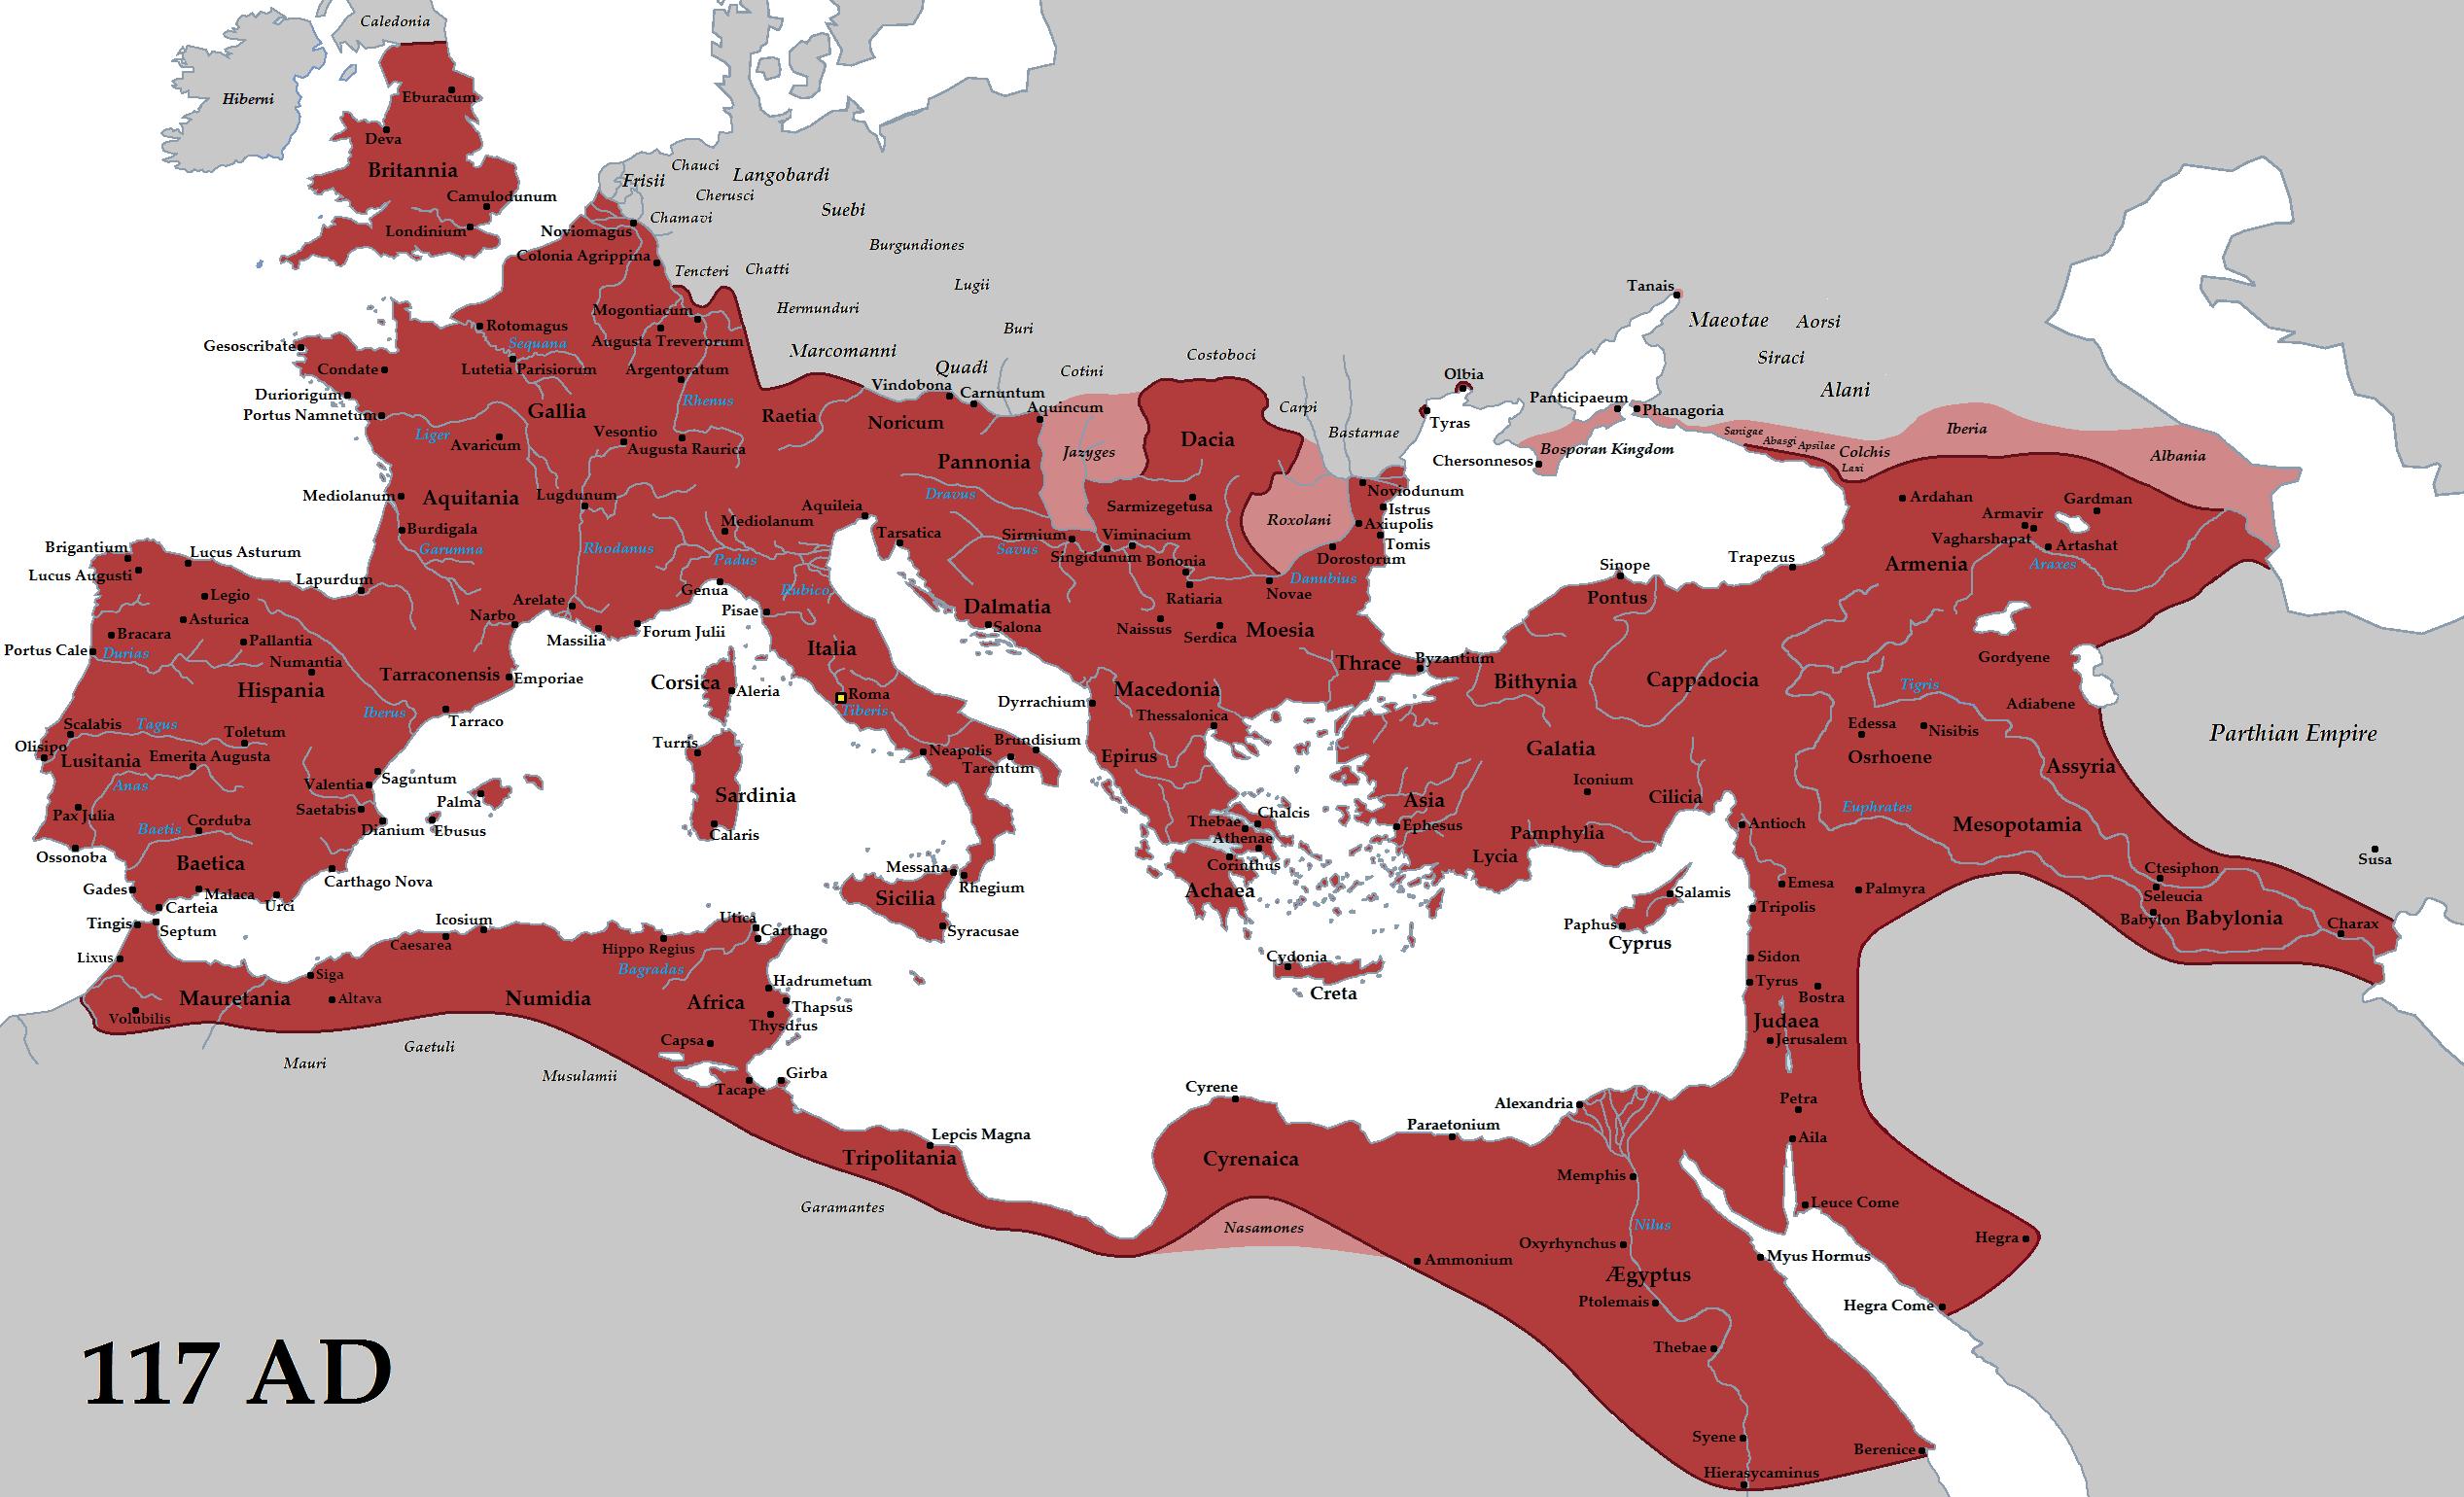 Roman_Empire_Trajan_117AD20160912.png